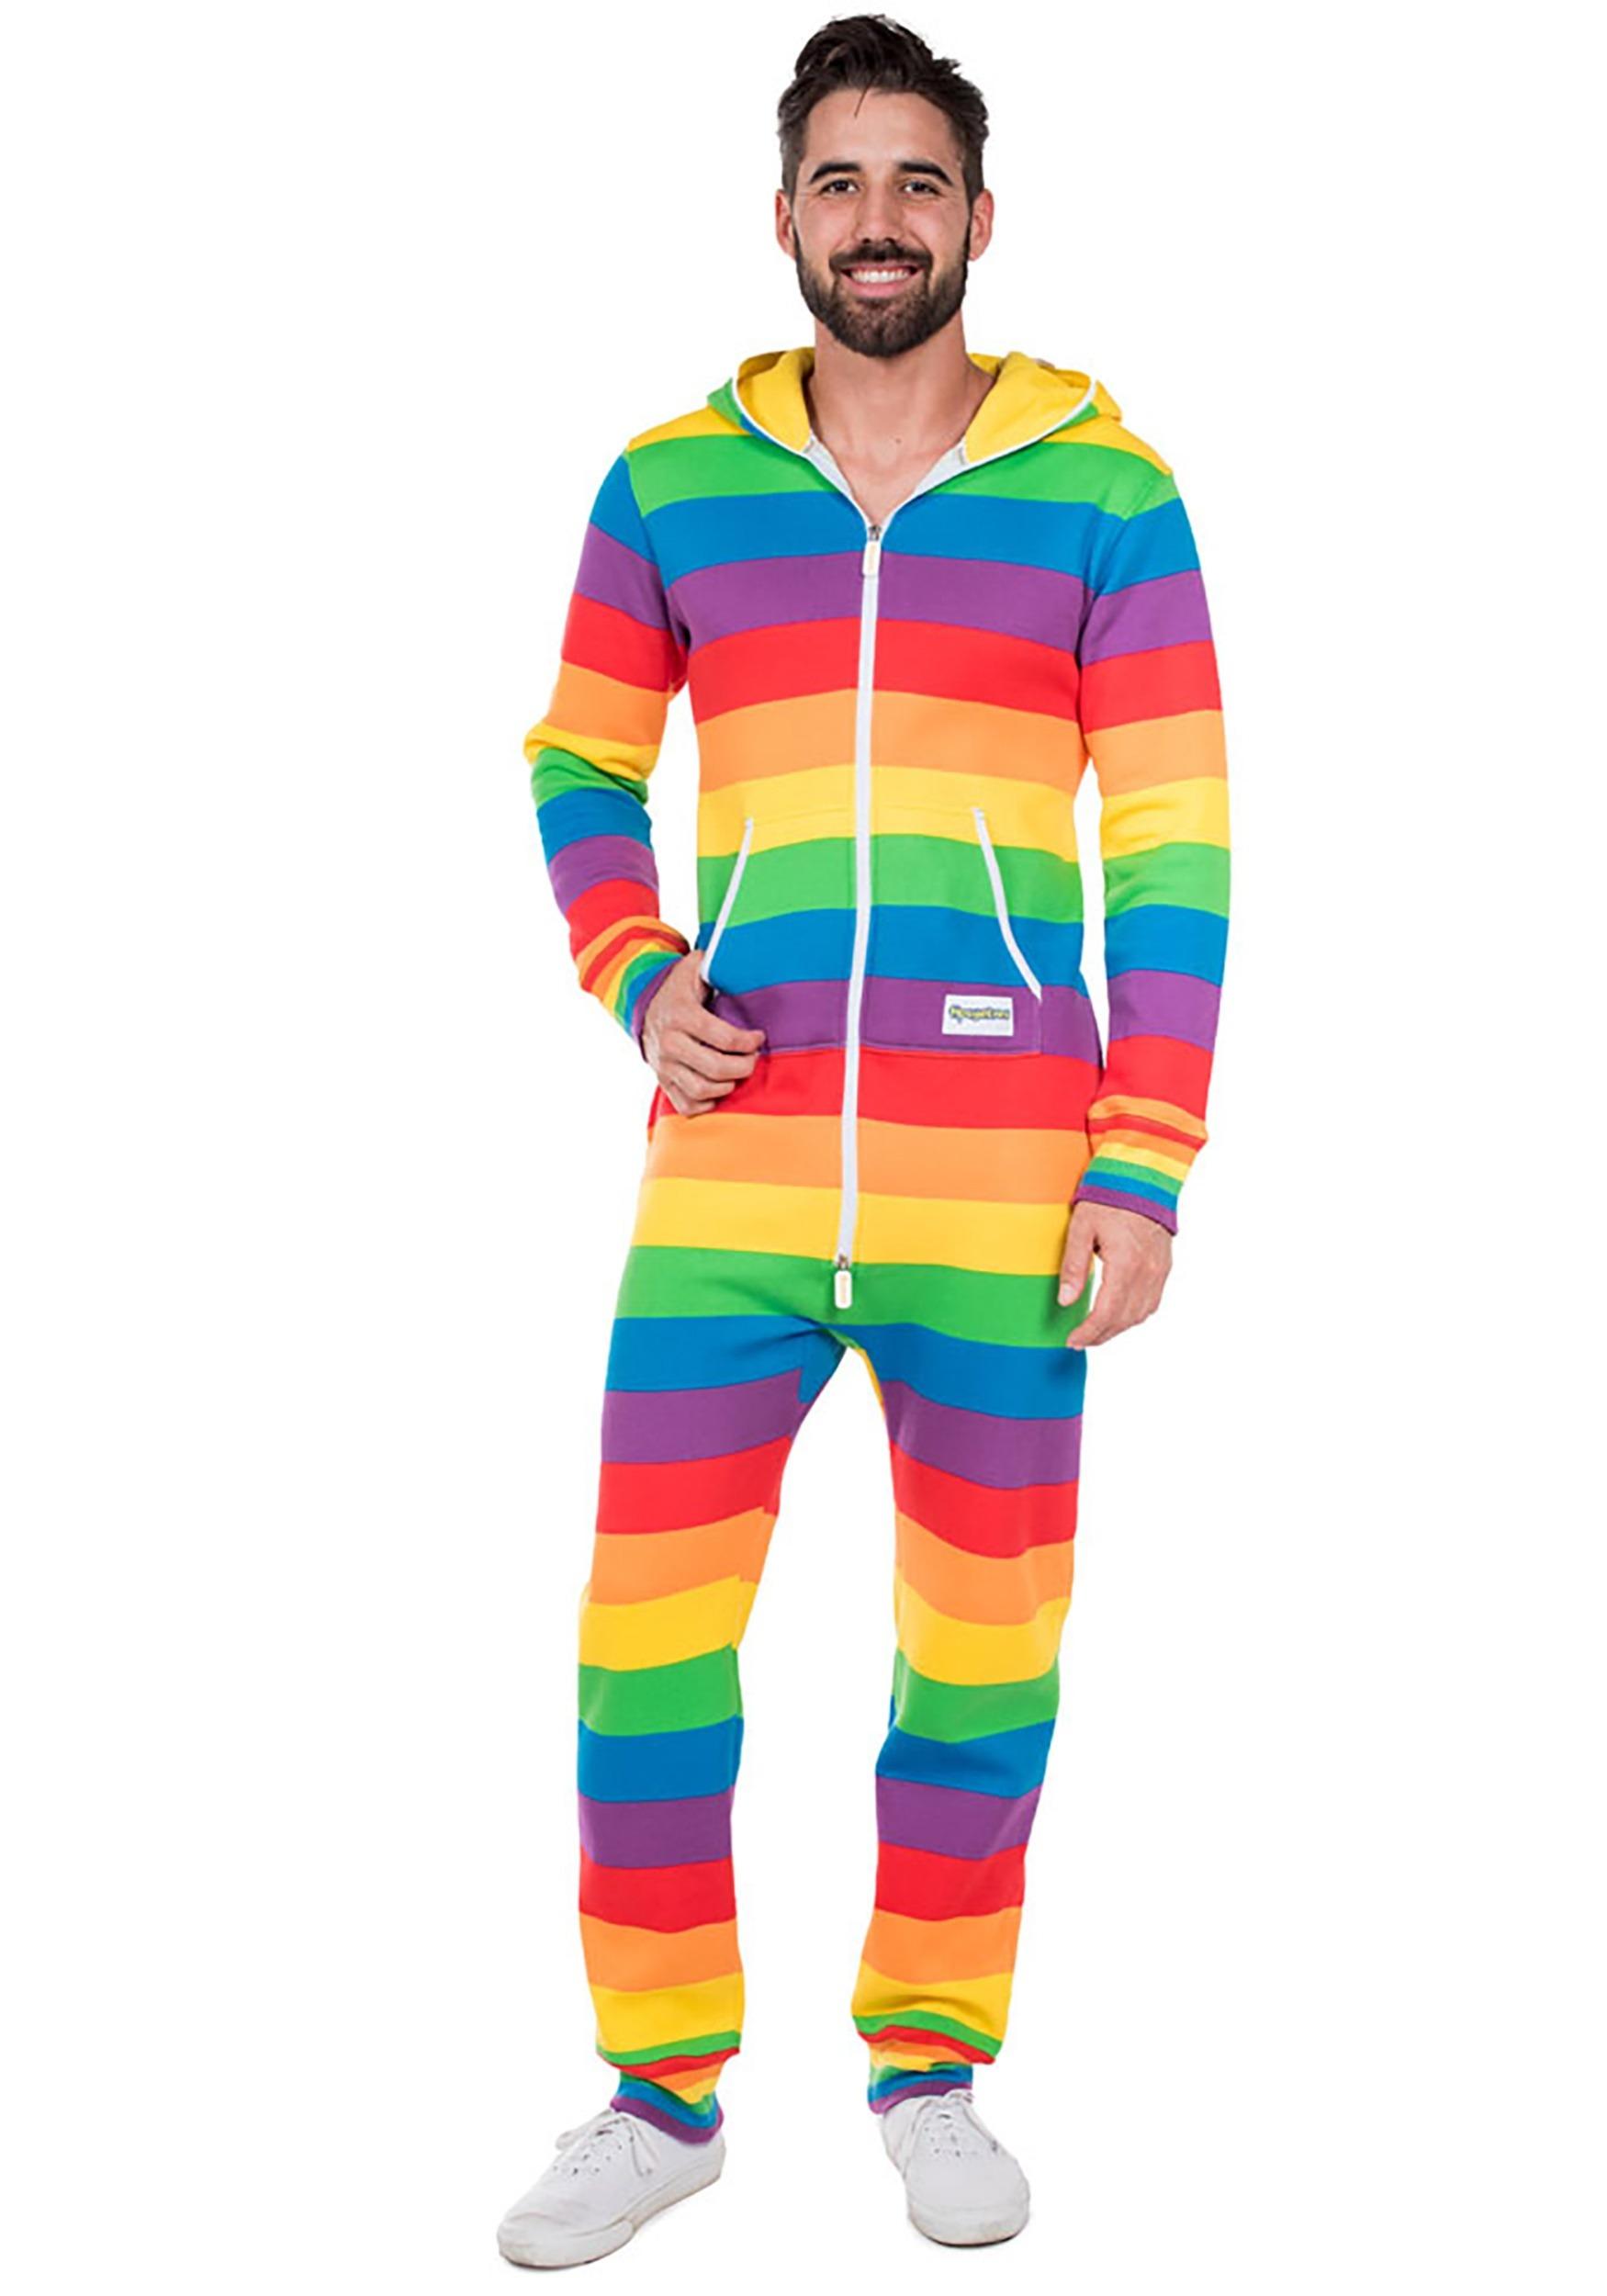 b3bae7946032da Men's Tipsy Elves Rainbow Jumpsuit Costume